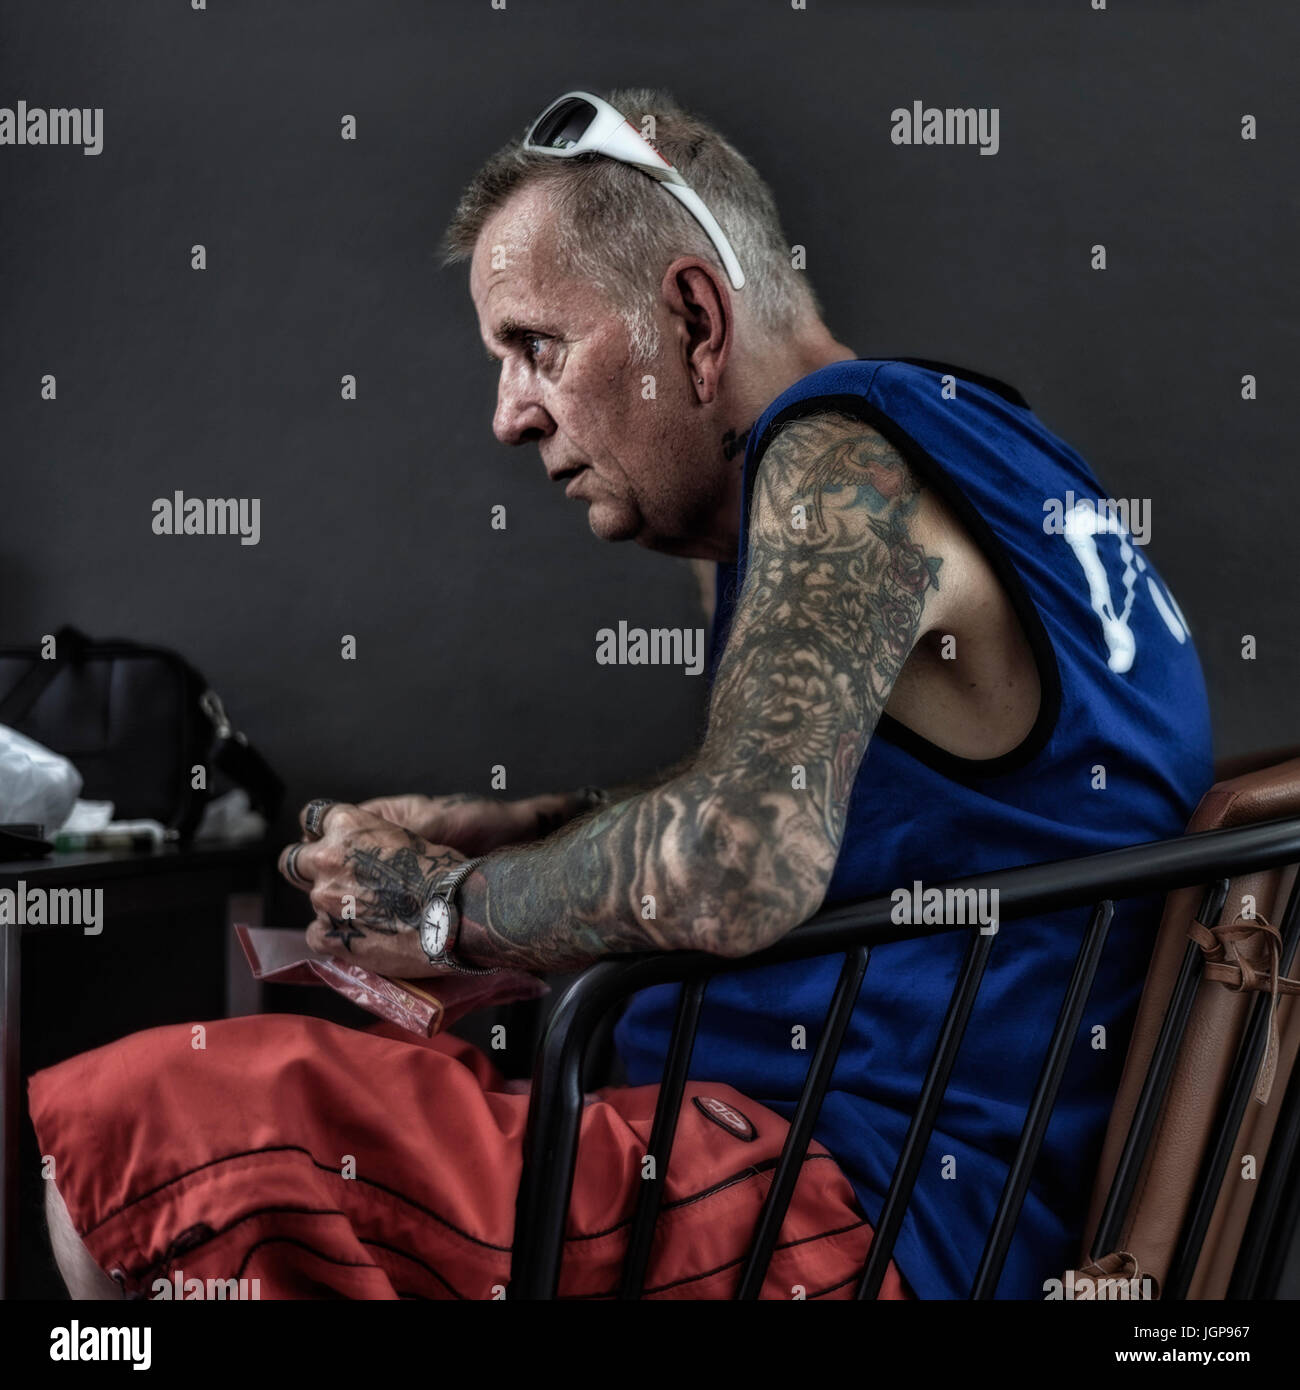 tattoo man arm stockfotos tattoo man arm bilder seite. Black Bedroom Furniture Sets. Home Design Ideas